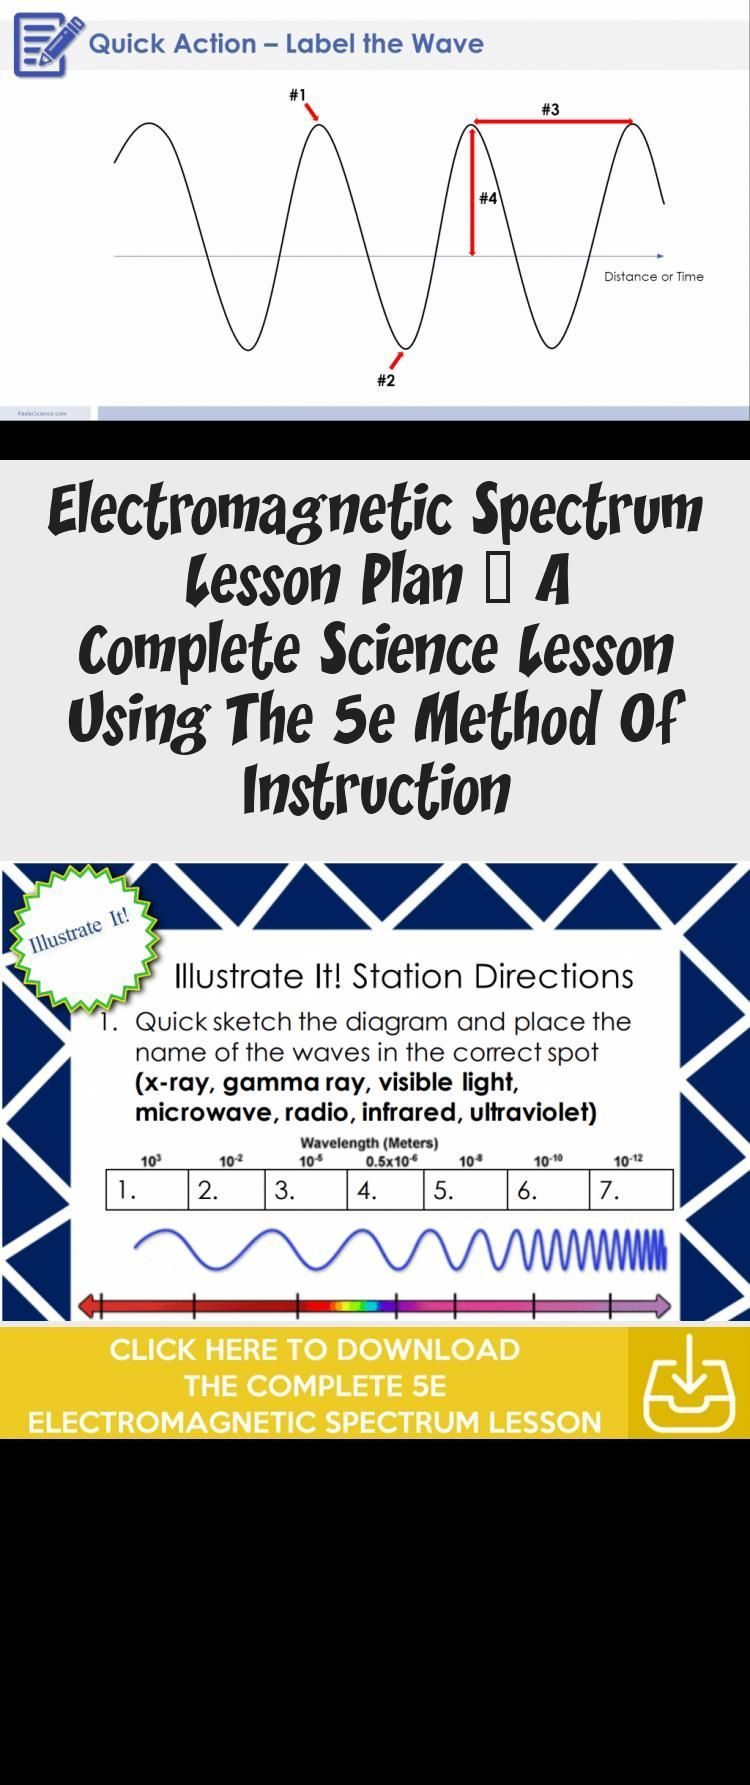 Spectrum Lesson Plan A Complete Science